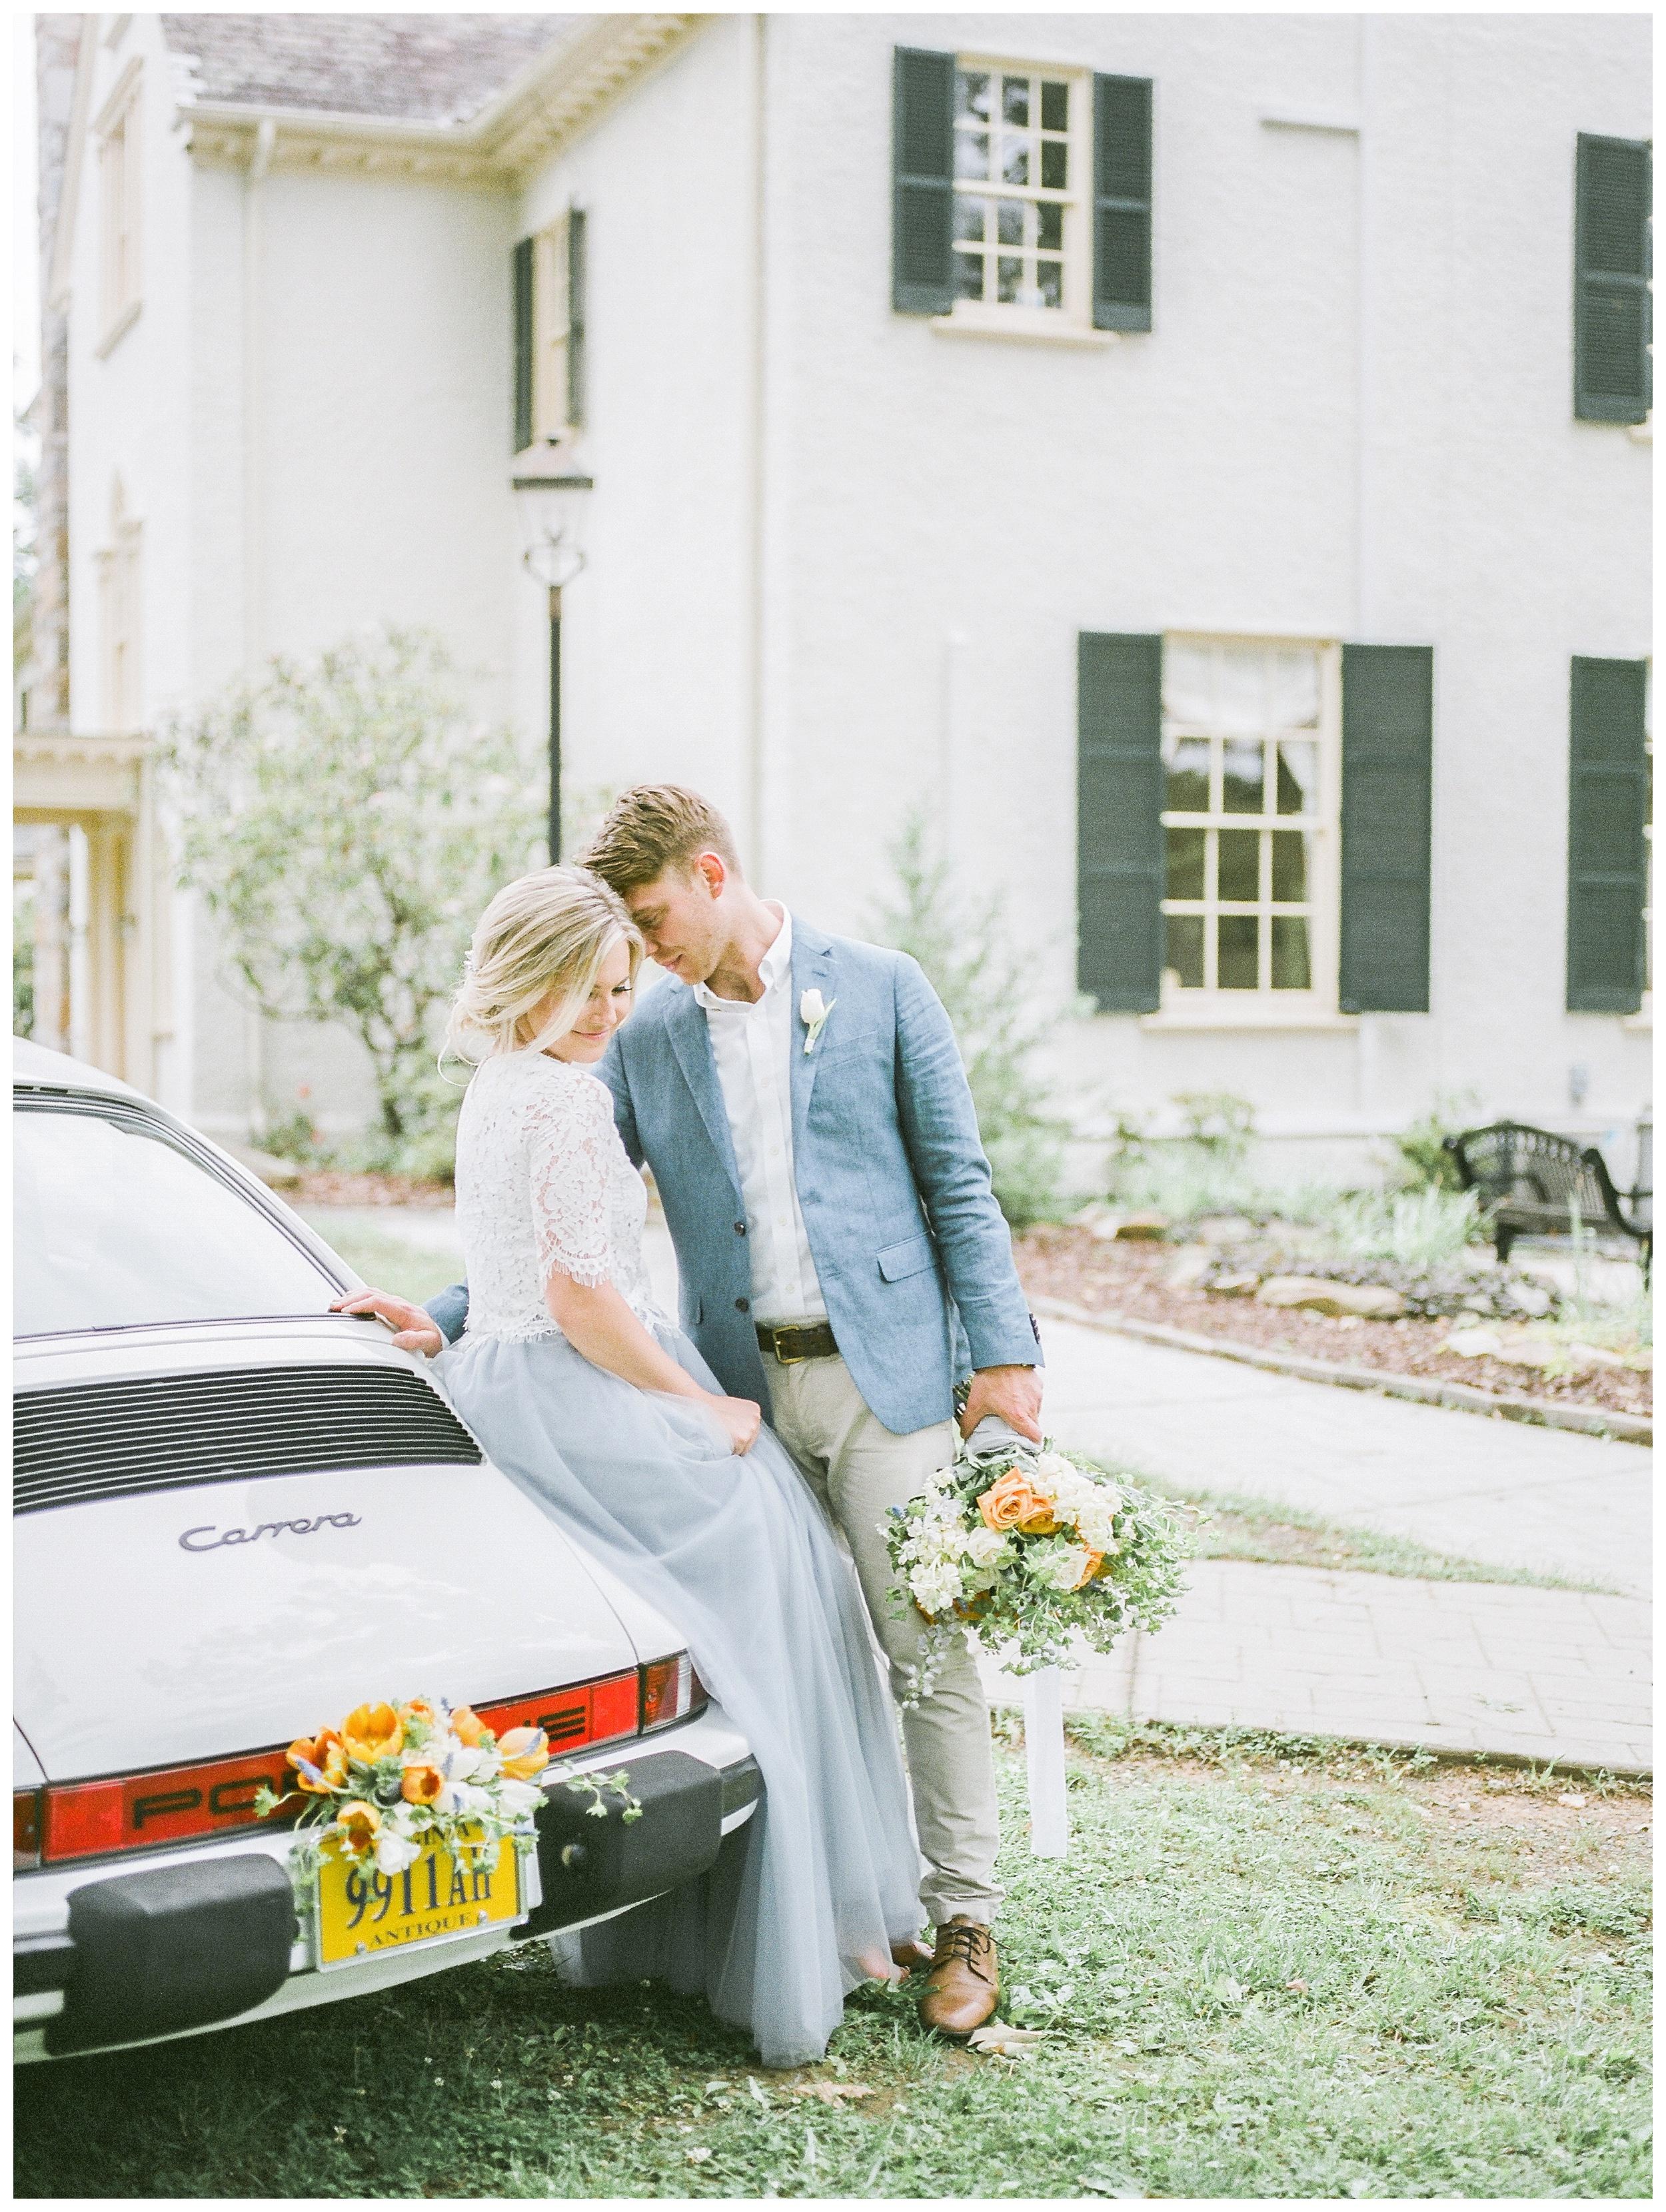 Rust Manor Wedding   Virginia Wedding Photographer Kir Tuben_0013.jpg